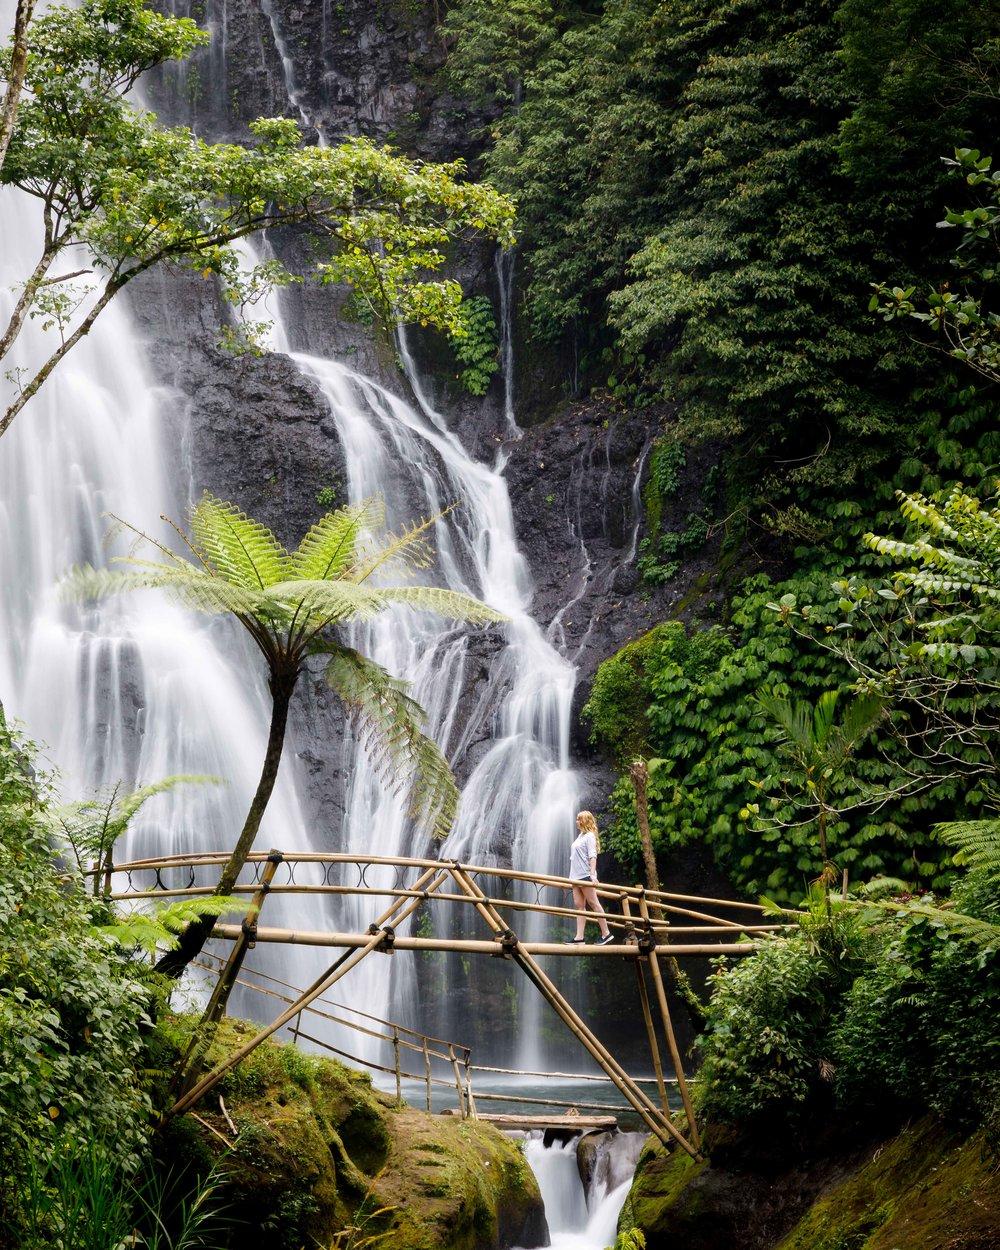 Most Instagrammable Spots in Bali: Banyumala Waterfall